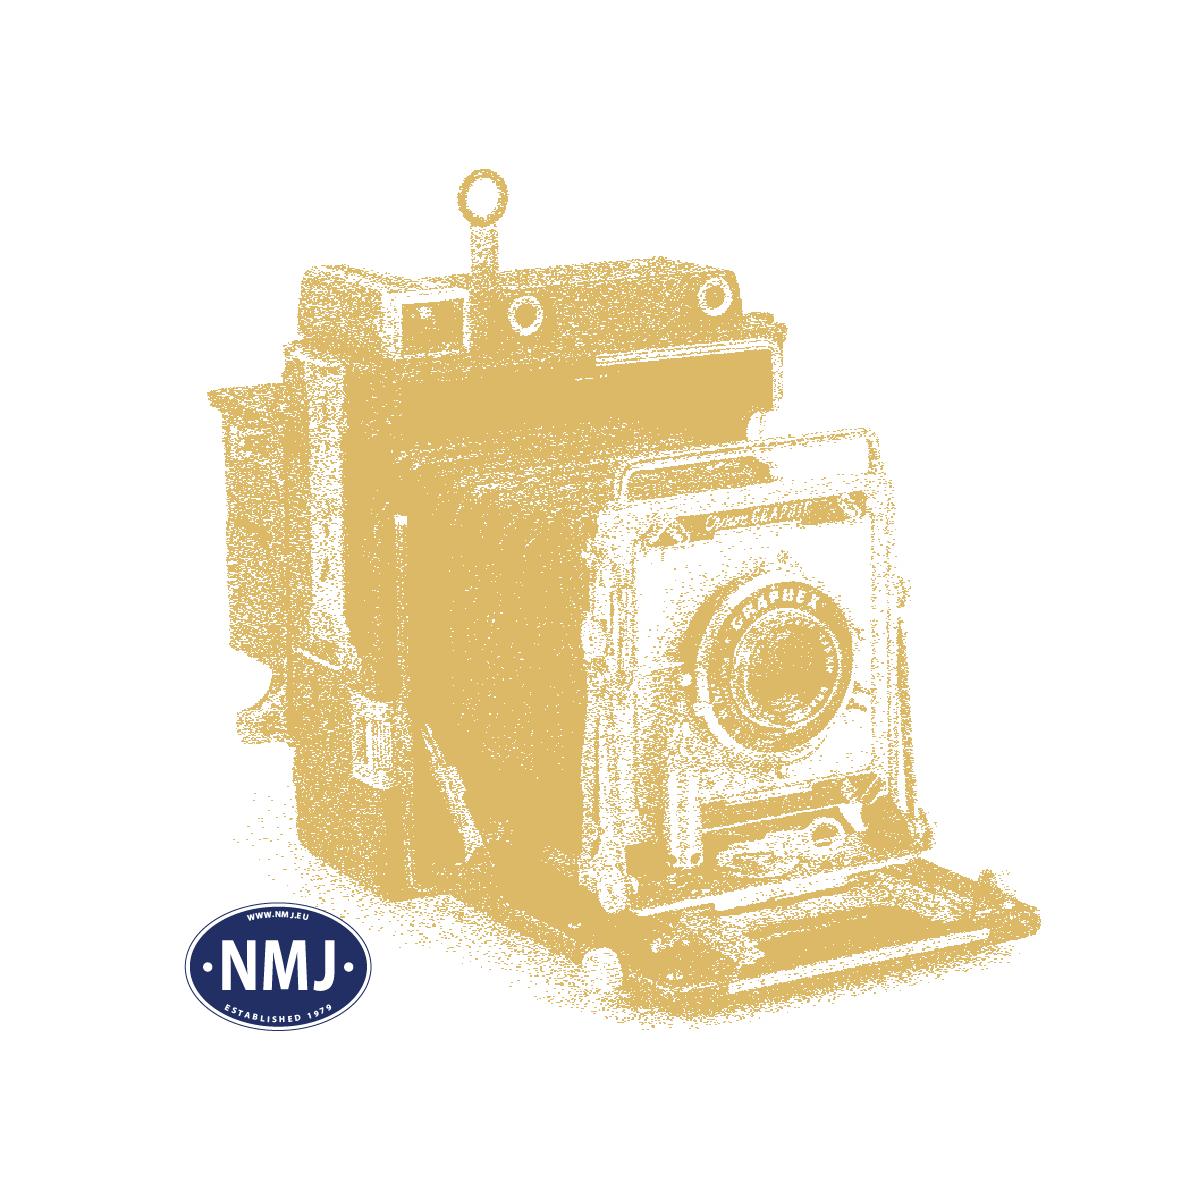 NMJT95301 - NMJ Topline CFL 1602 (1971-->), AC Digital